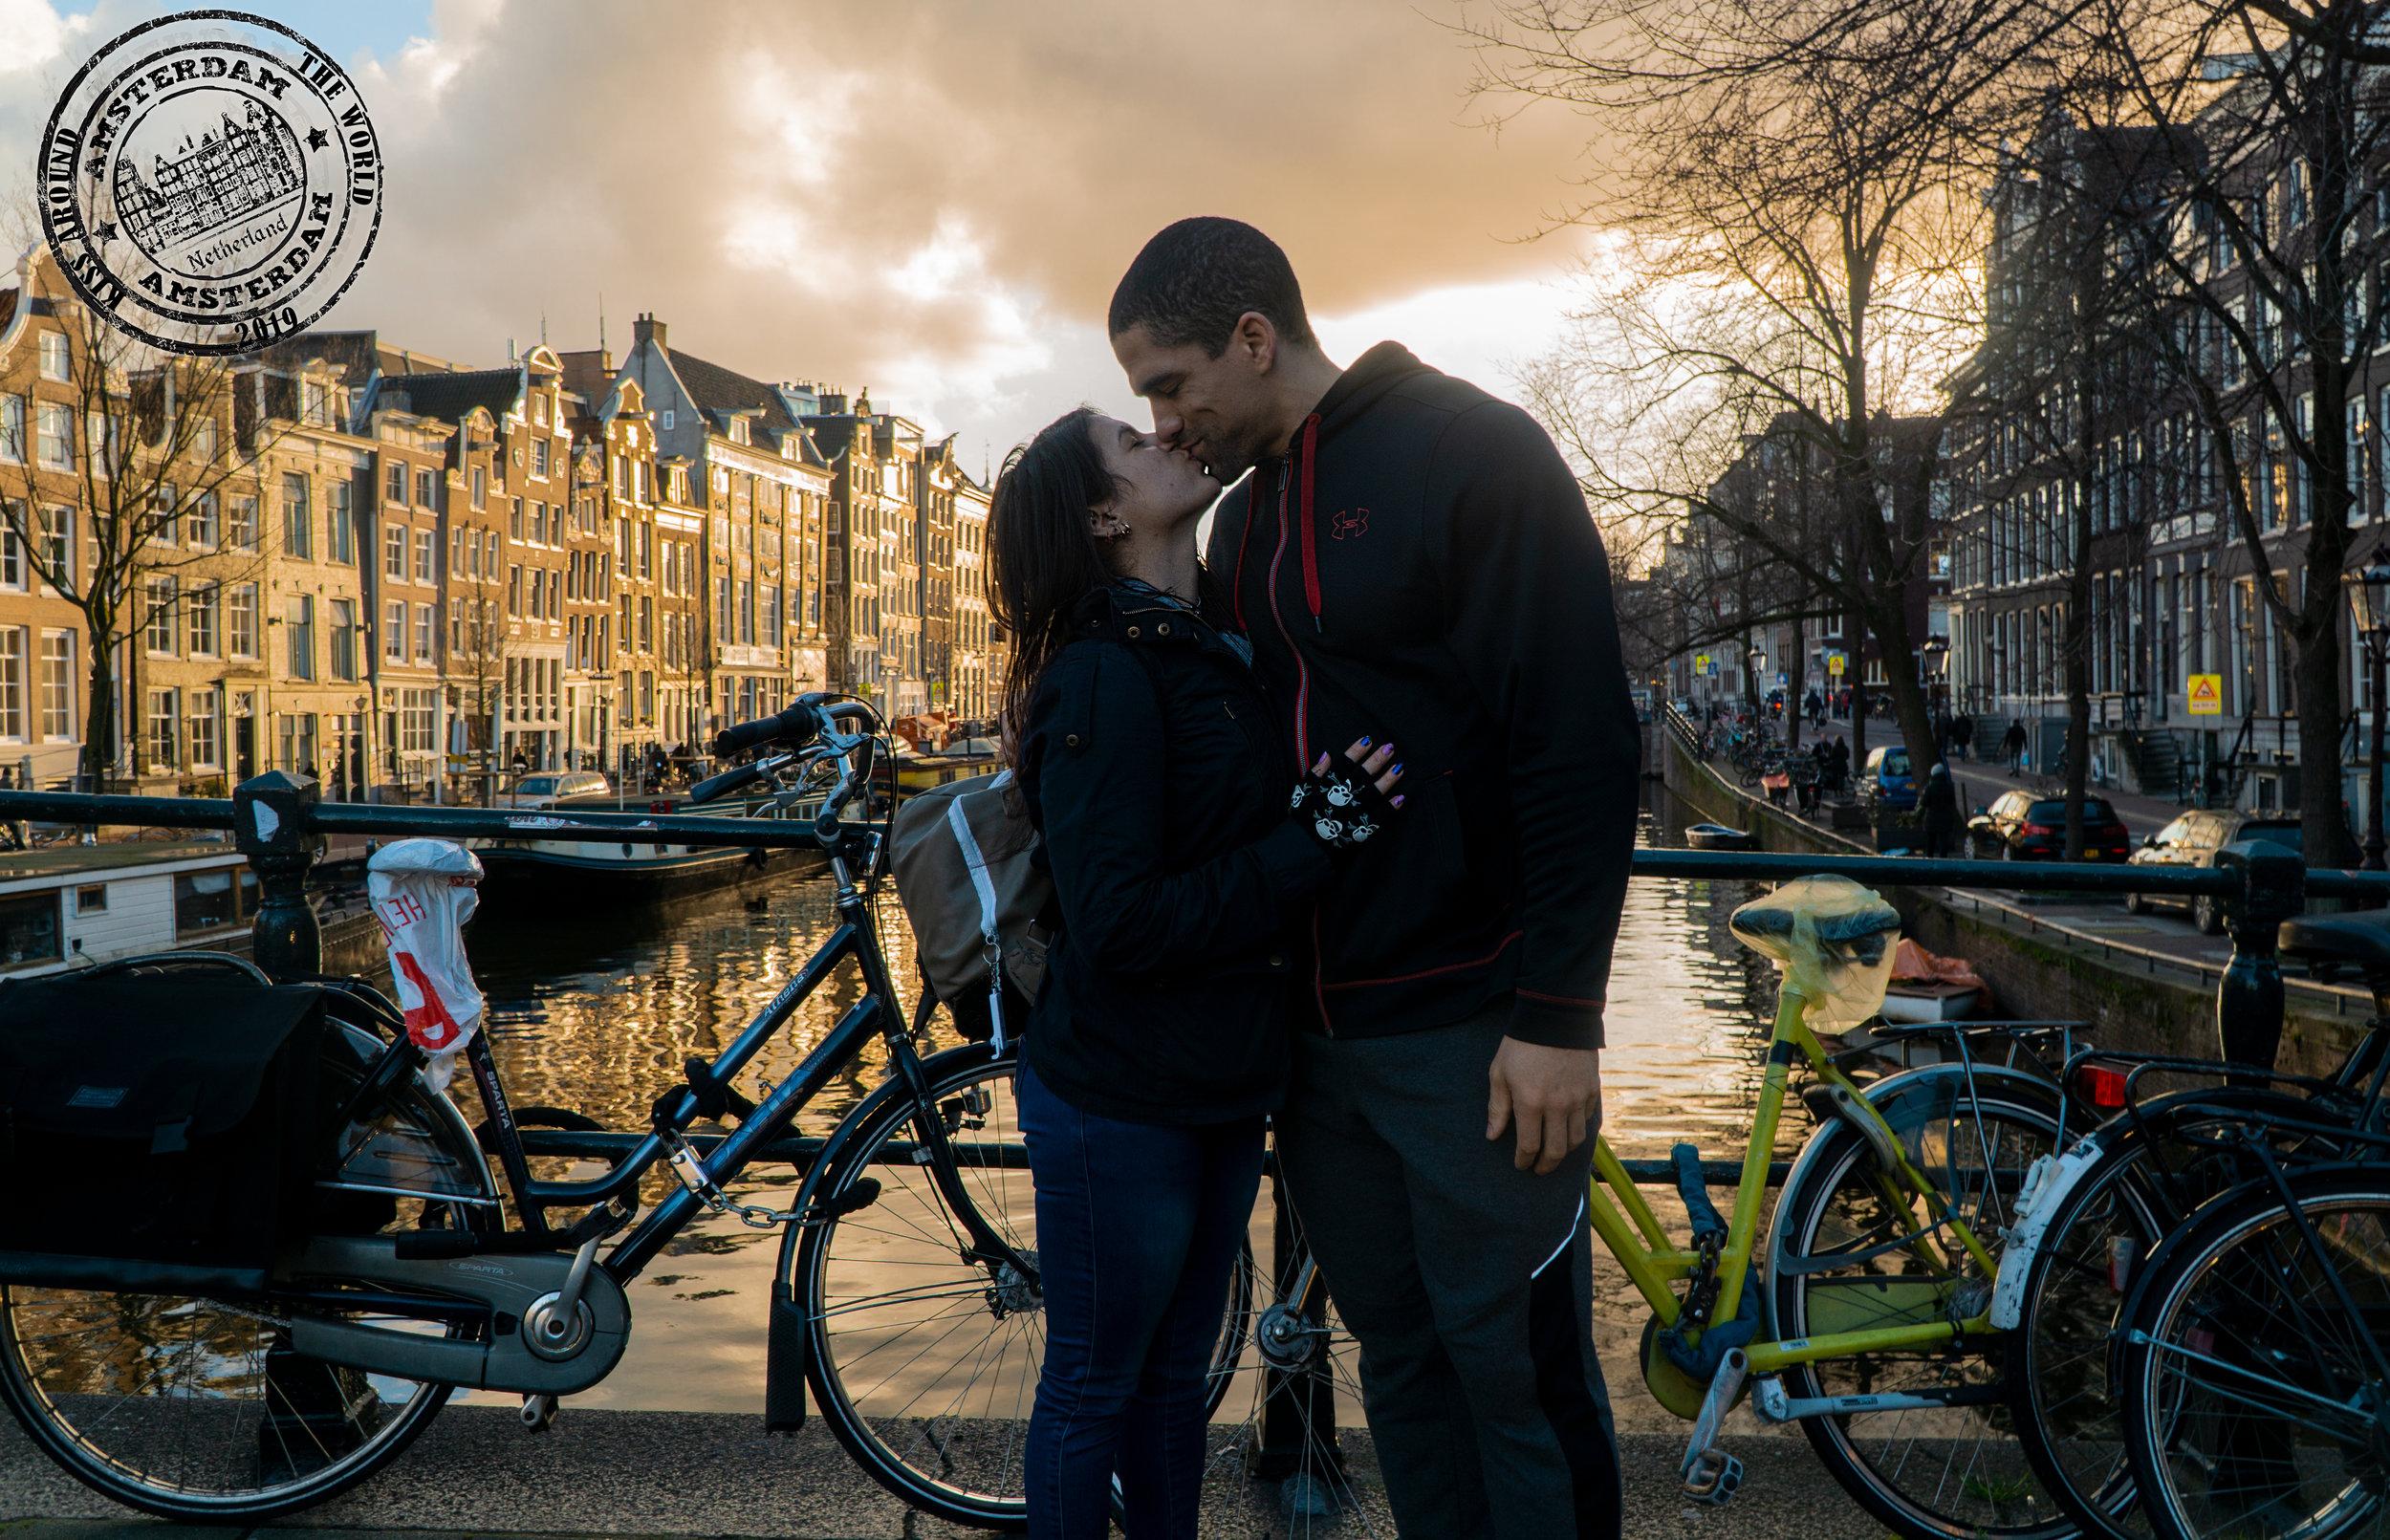 Amsterdam_vickygood_photography_kiss-around-the-world.jpg